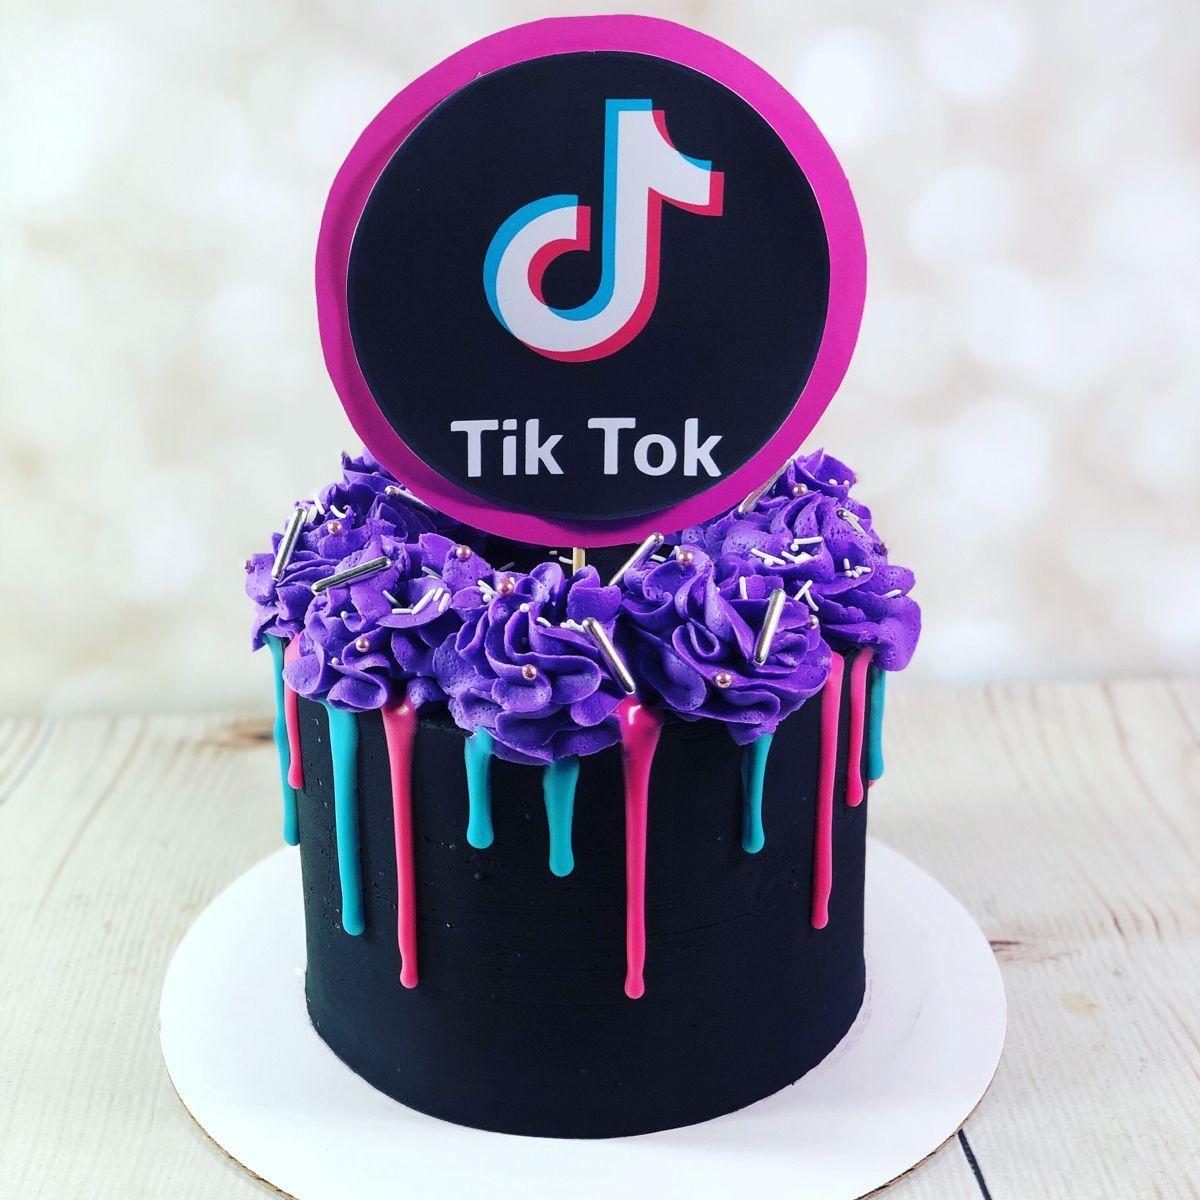 TikTok cake in 2020   Cake, 10 birthday cake, Ocean cakes   Tiktok 10th Birthday Cake